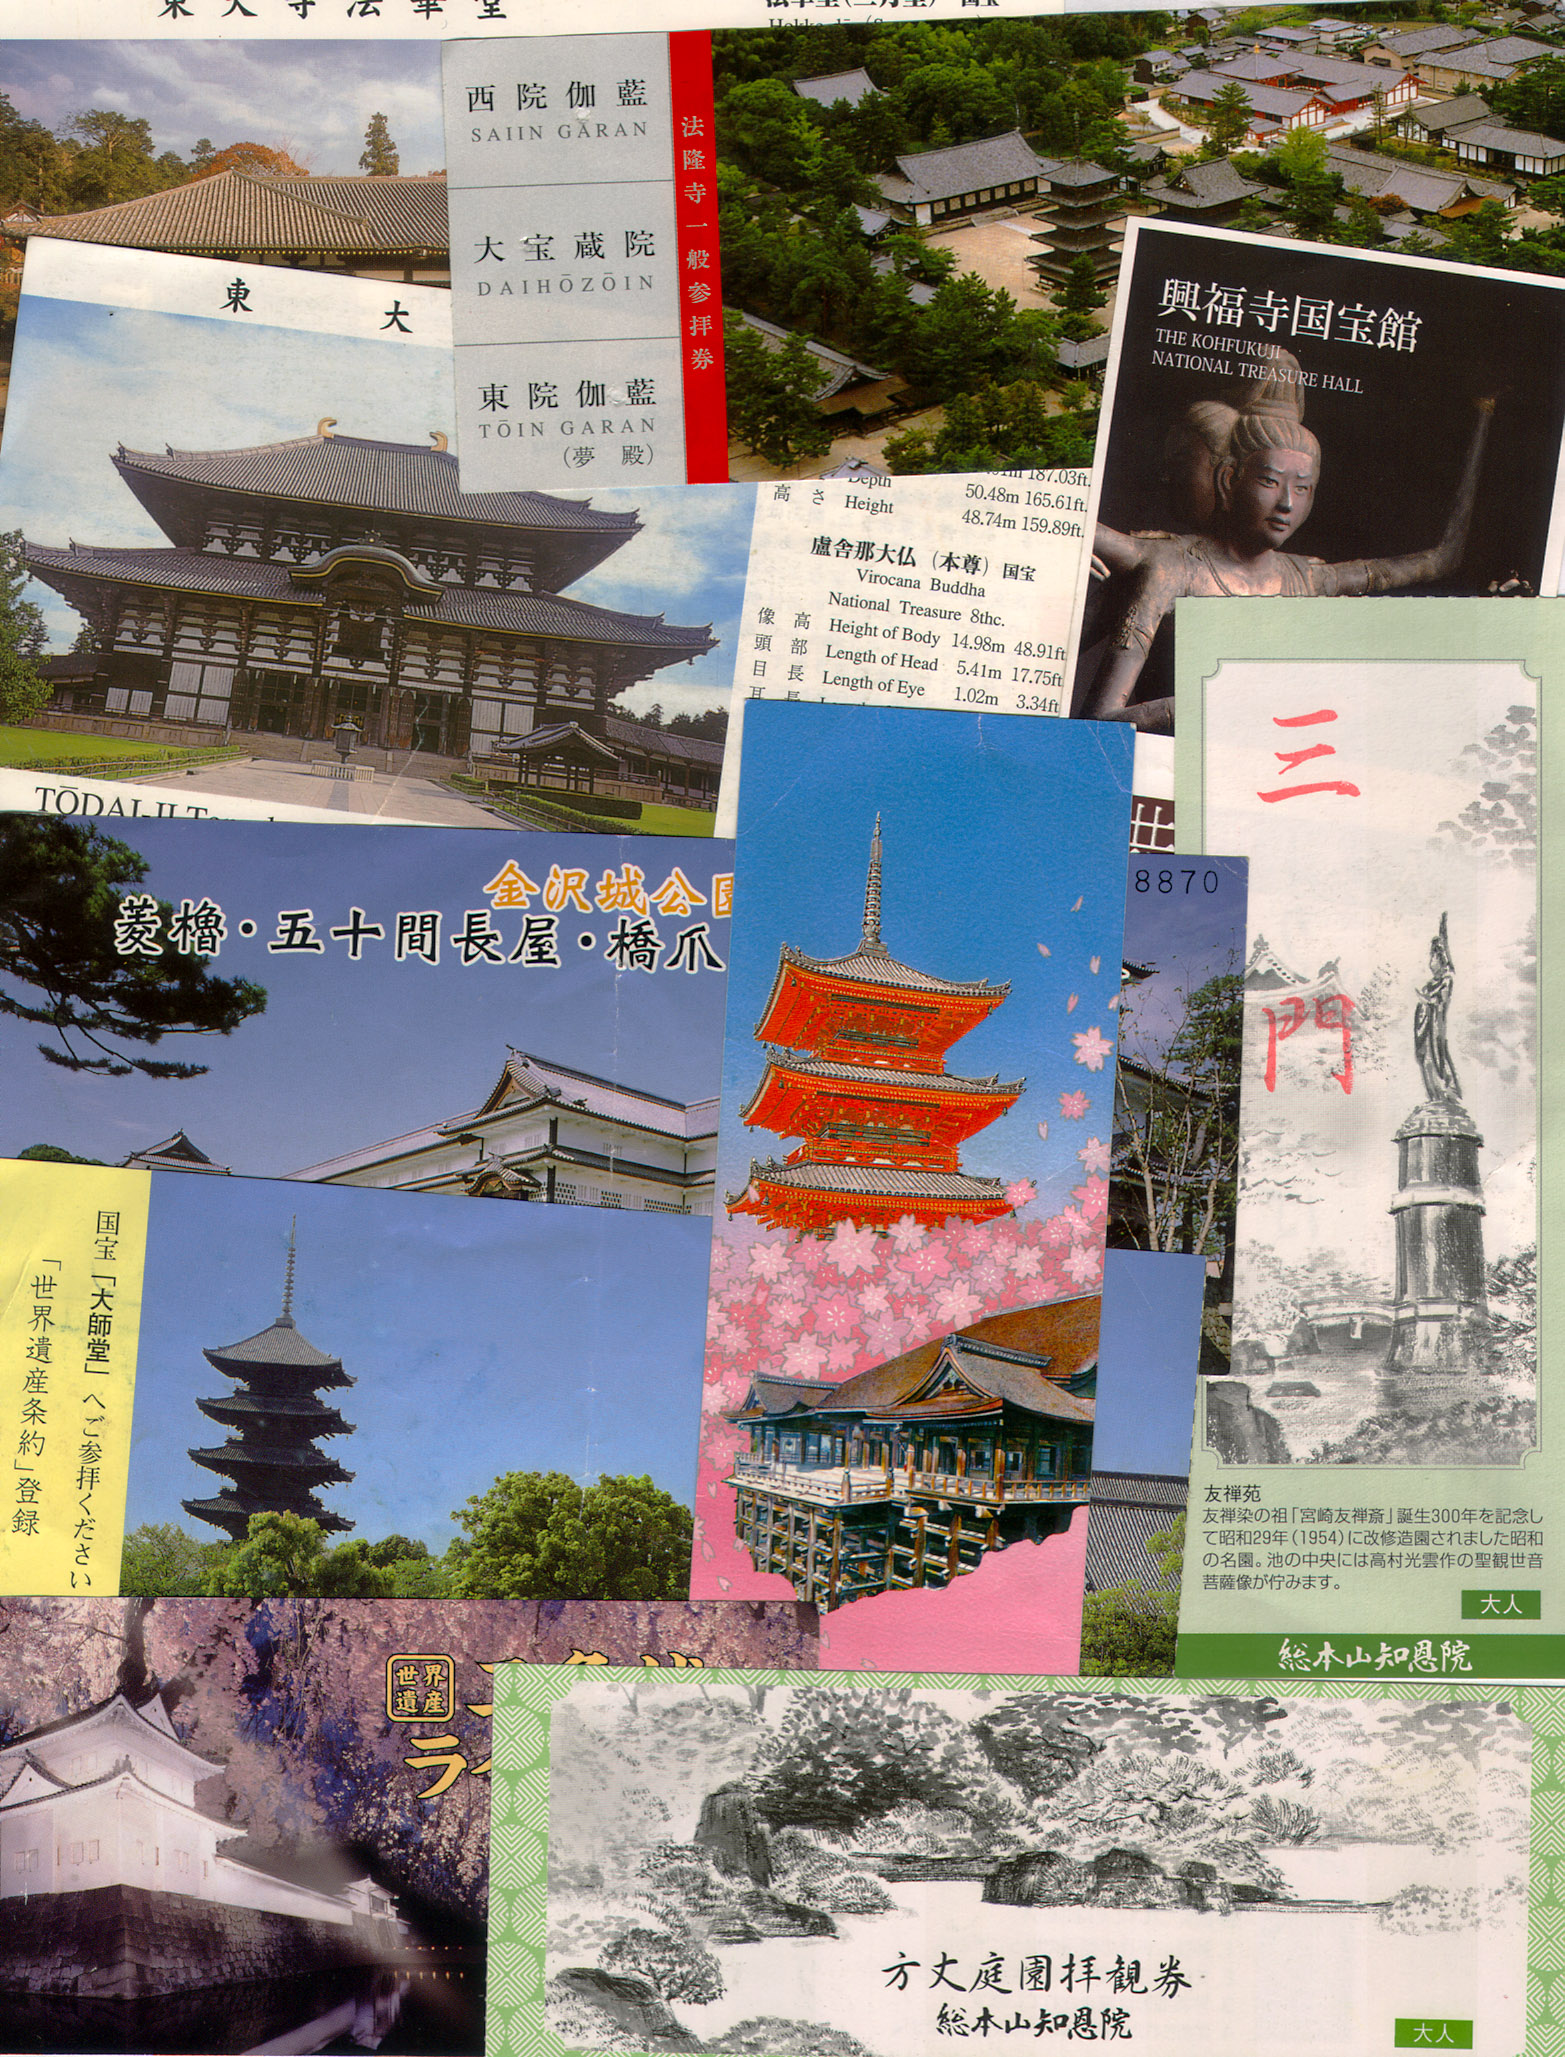 Japanese Ticket Stubs